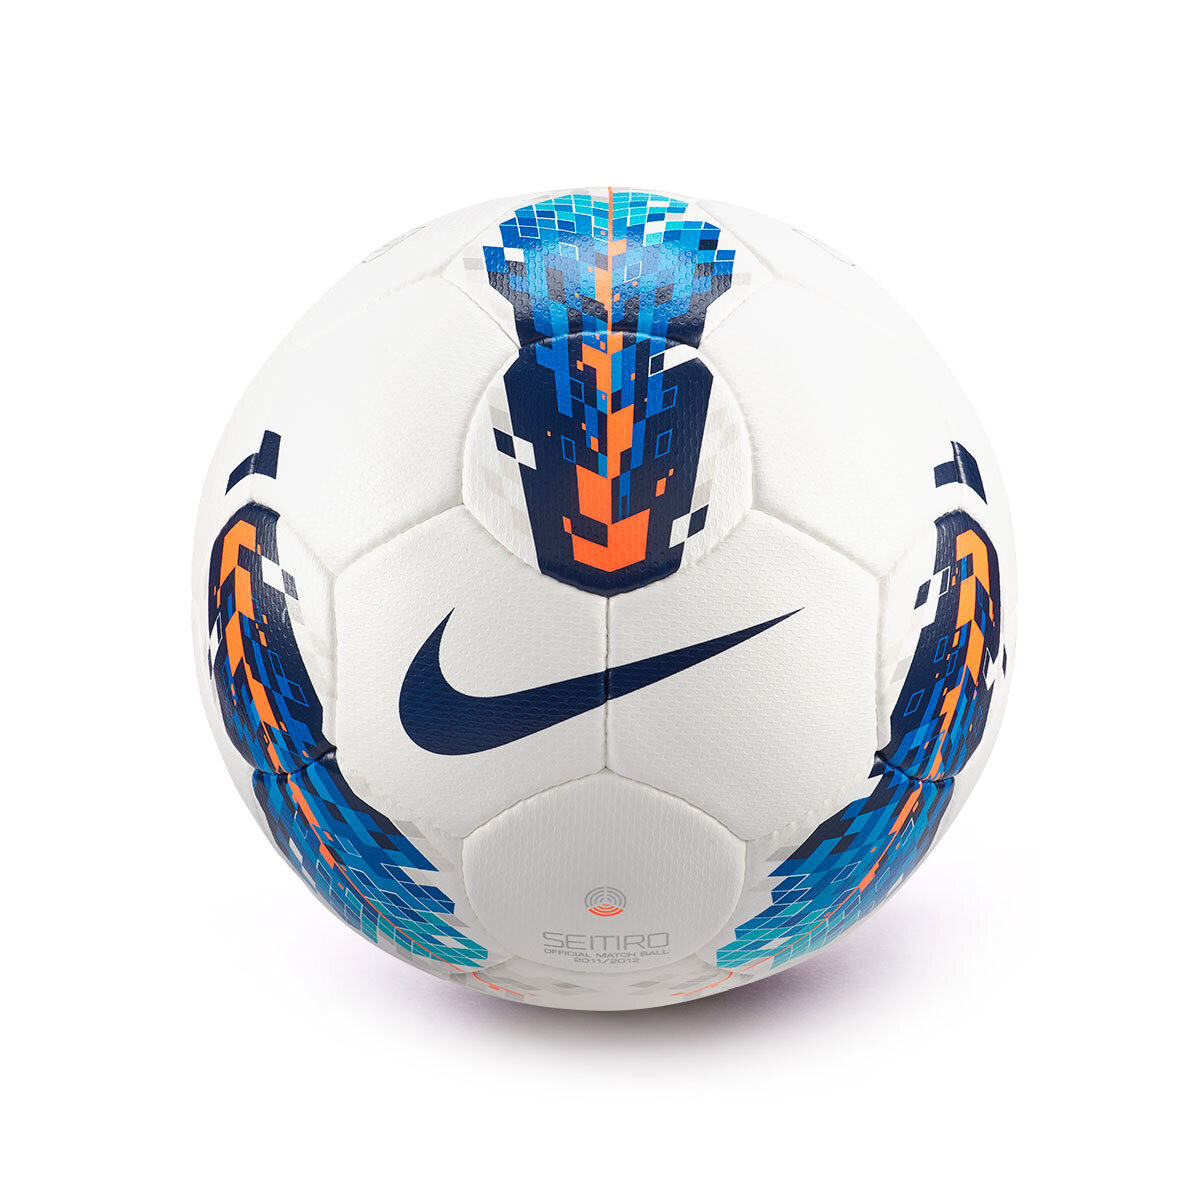 Manhattan Humedad Itaca  Ball Nike Premier League Seitiro 2020-2021 White-Multicolor-Black -  Football store Fútbol Emotion